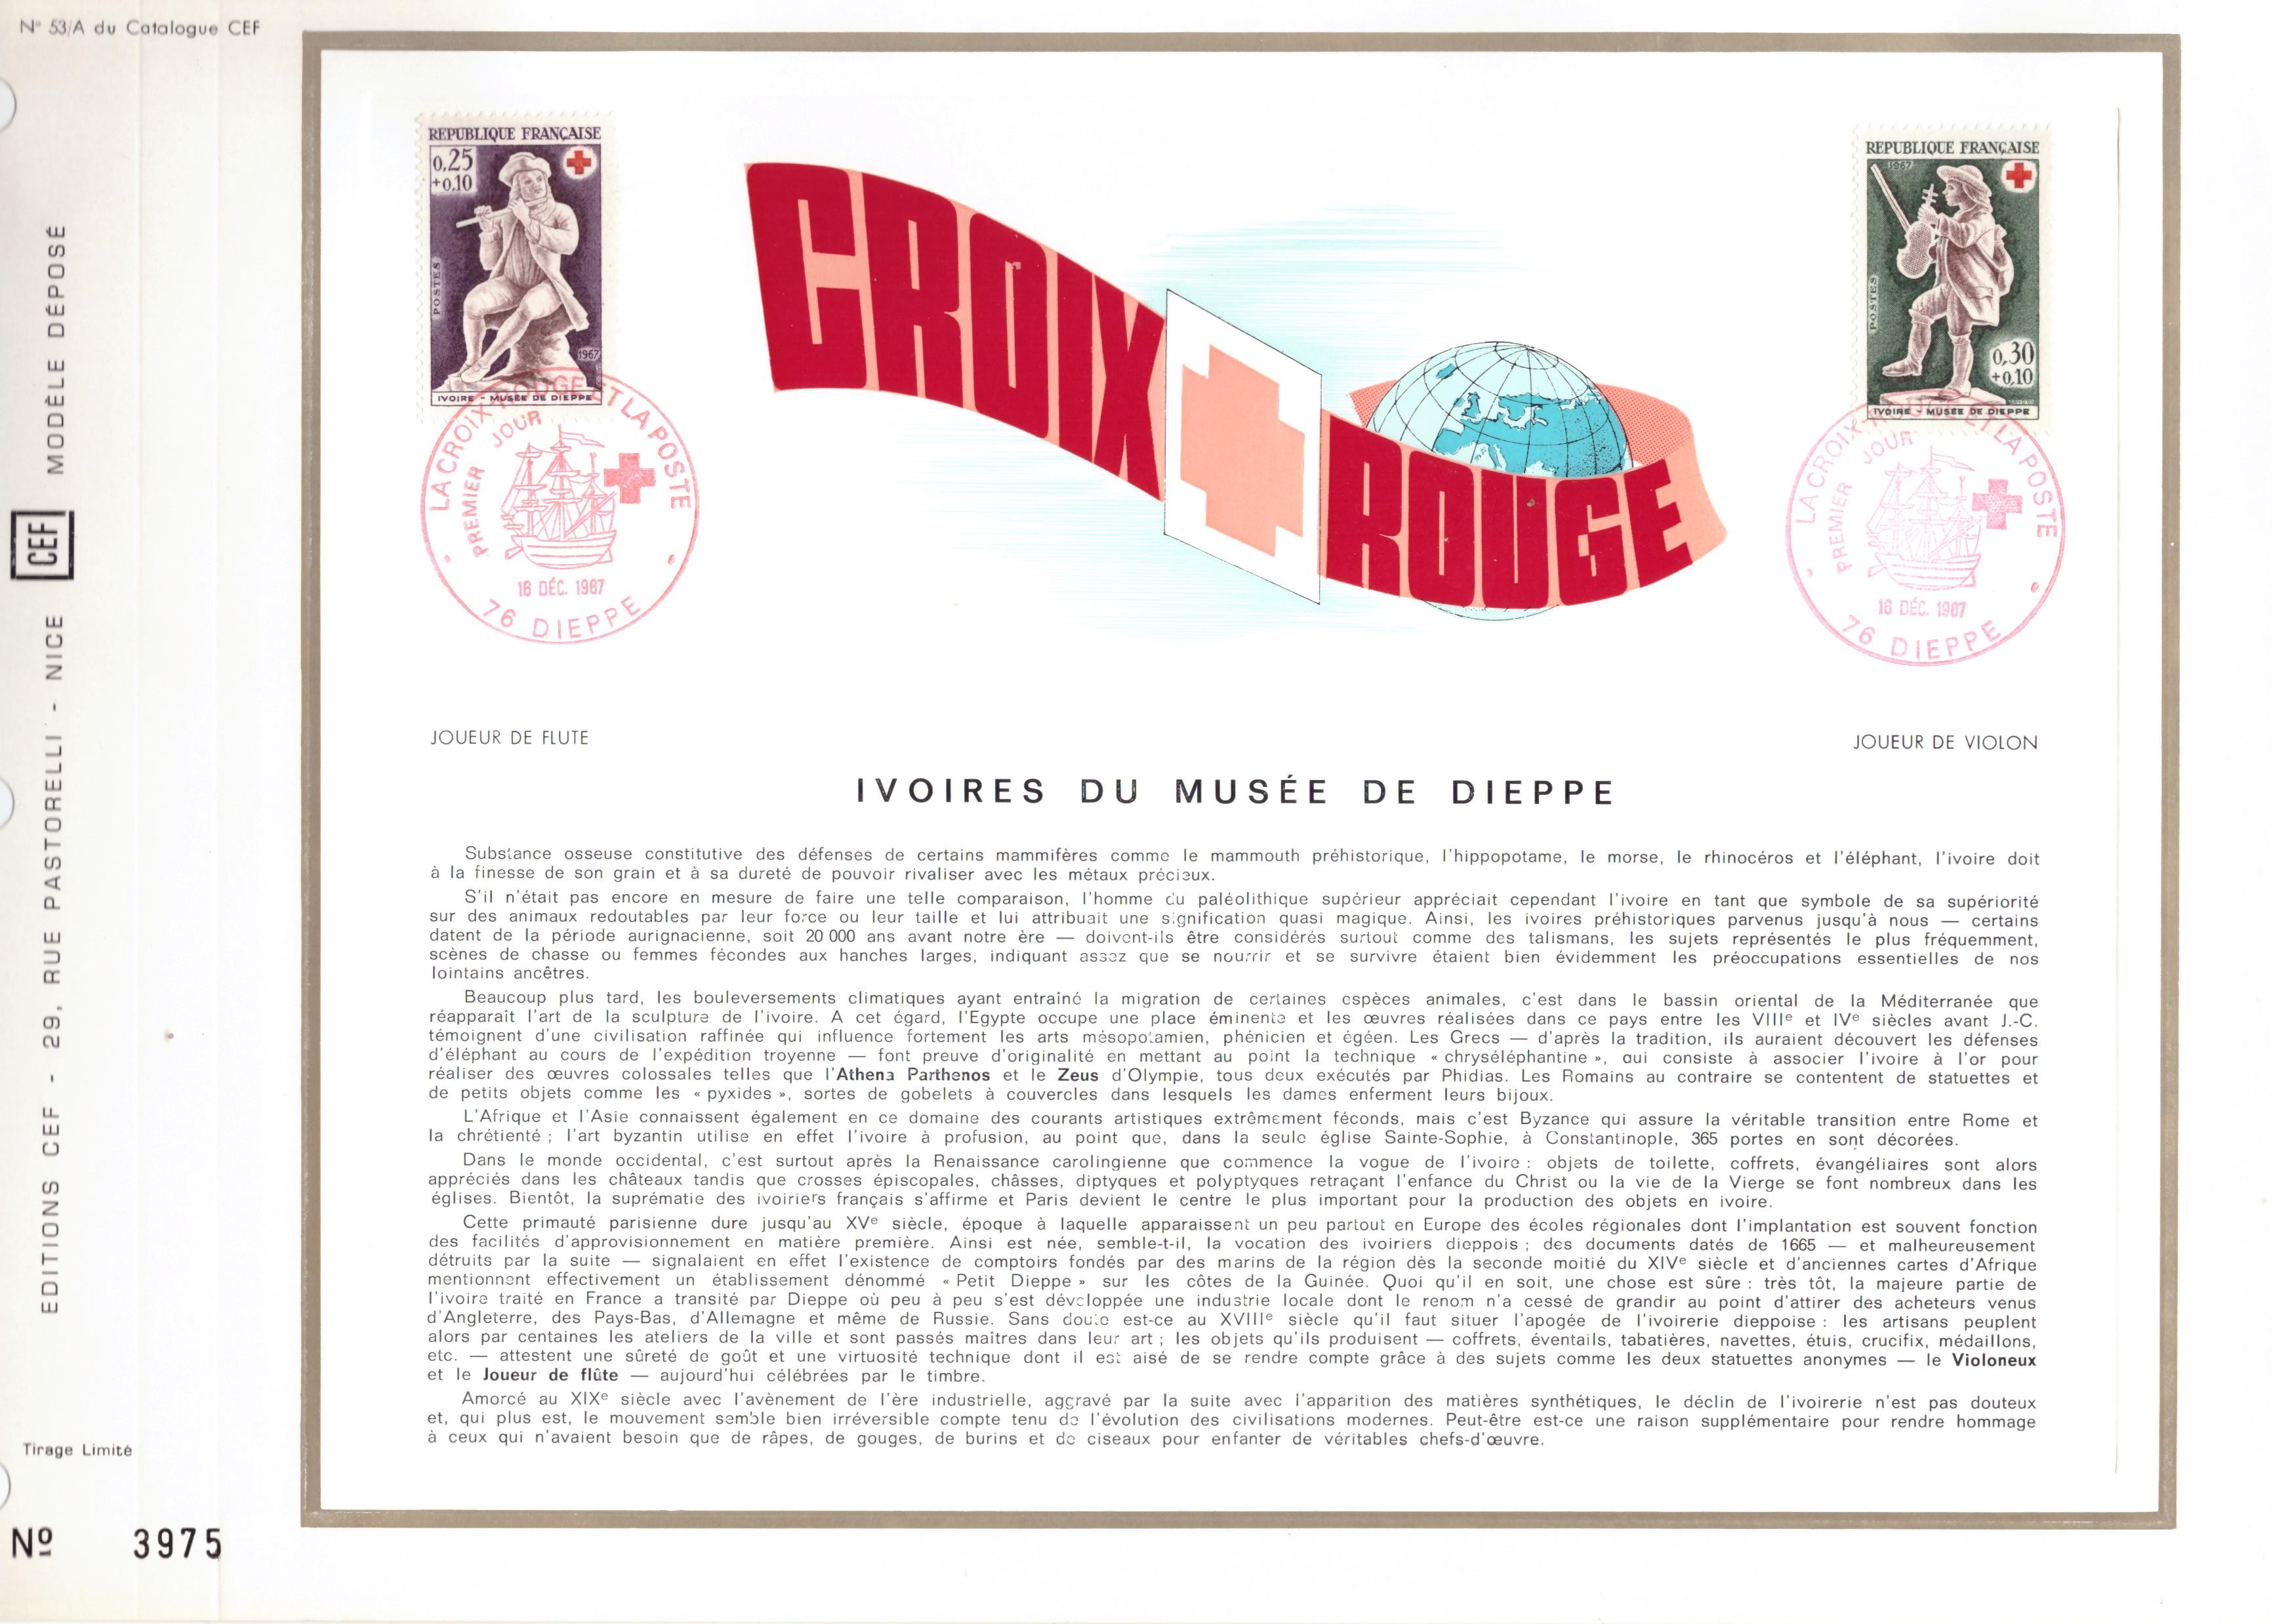 cef_croix_rouge_1967_53a.jpg